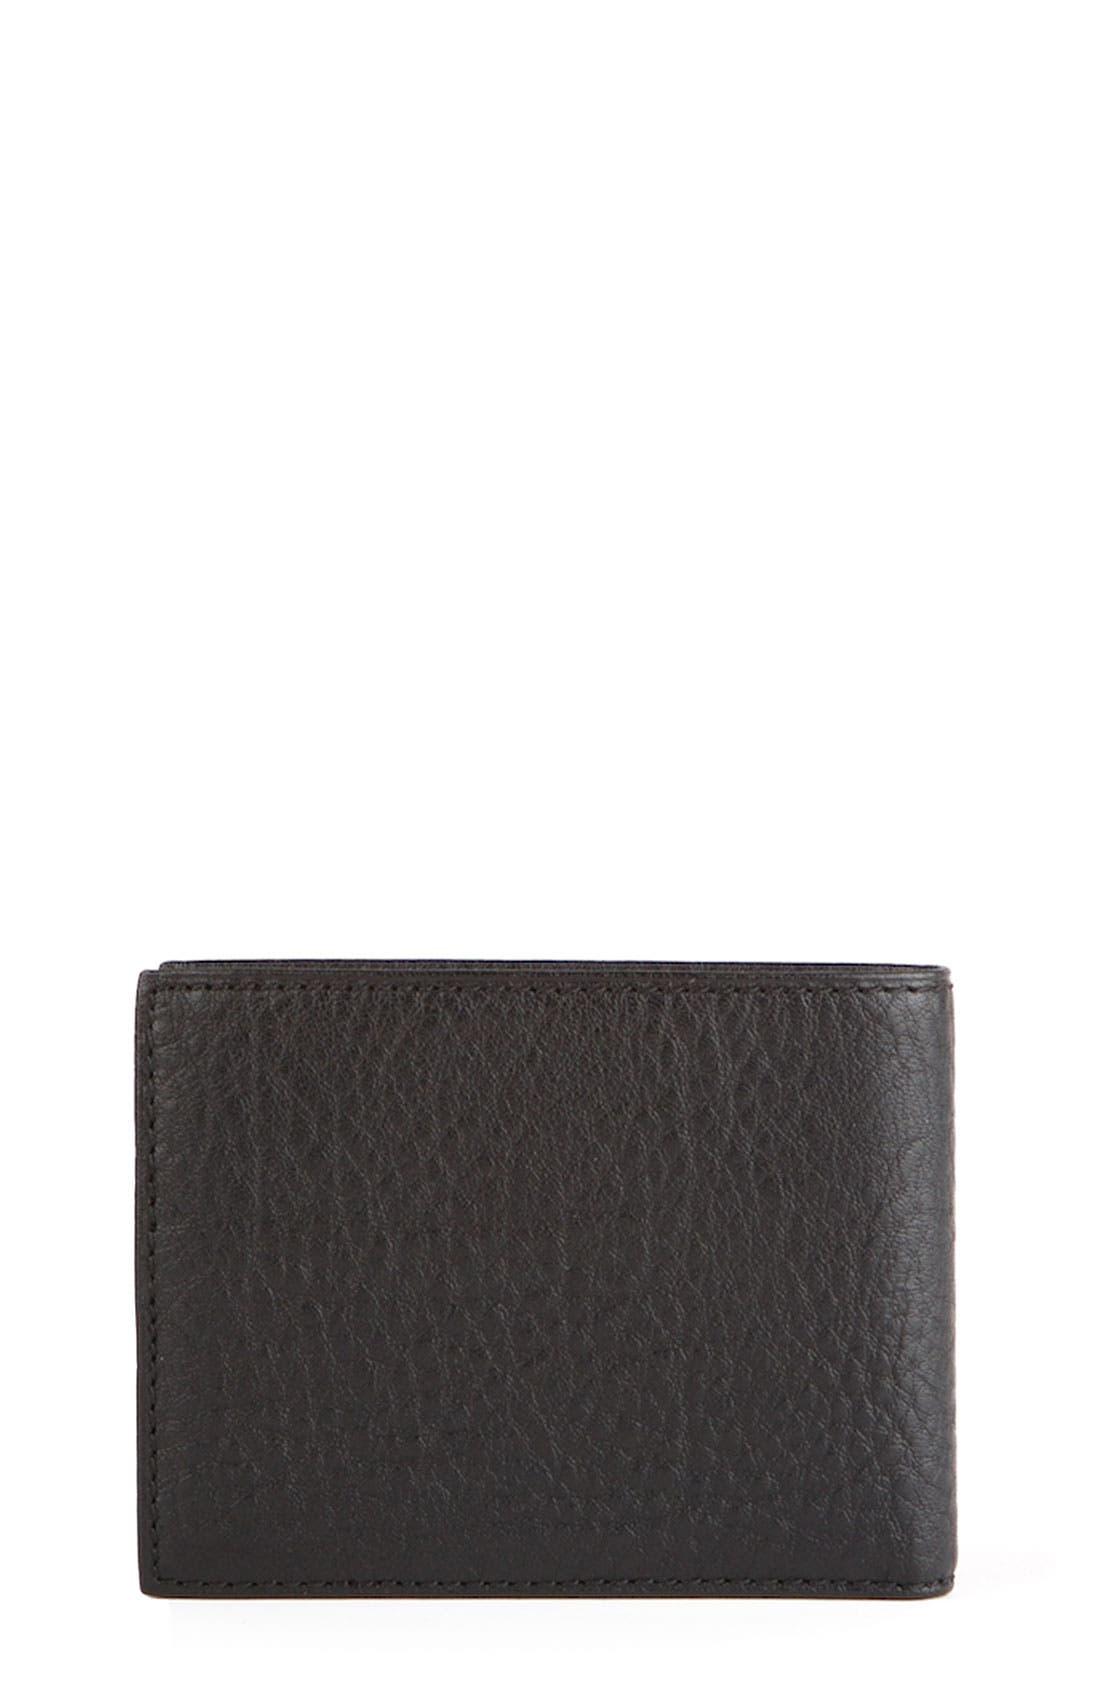 Main Image - Bosca ID Flap Bifold Leather Wallet